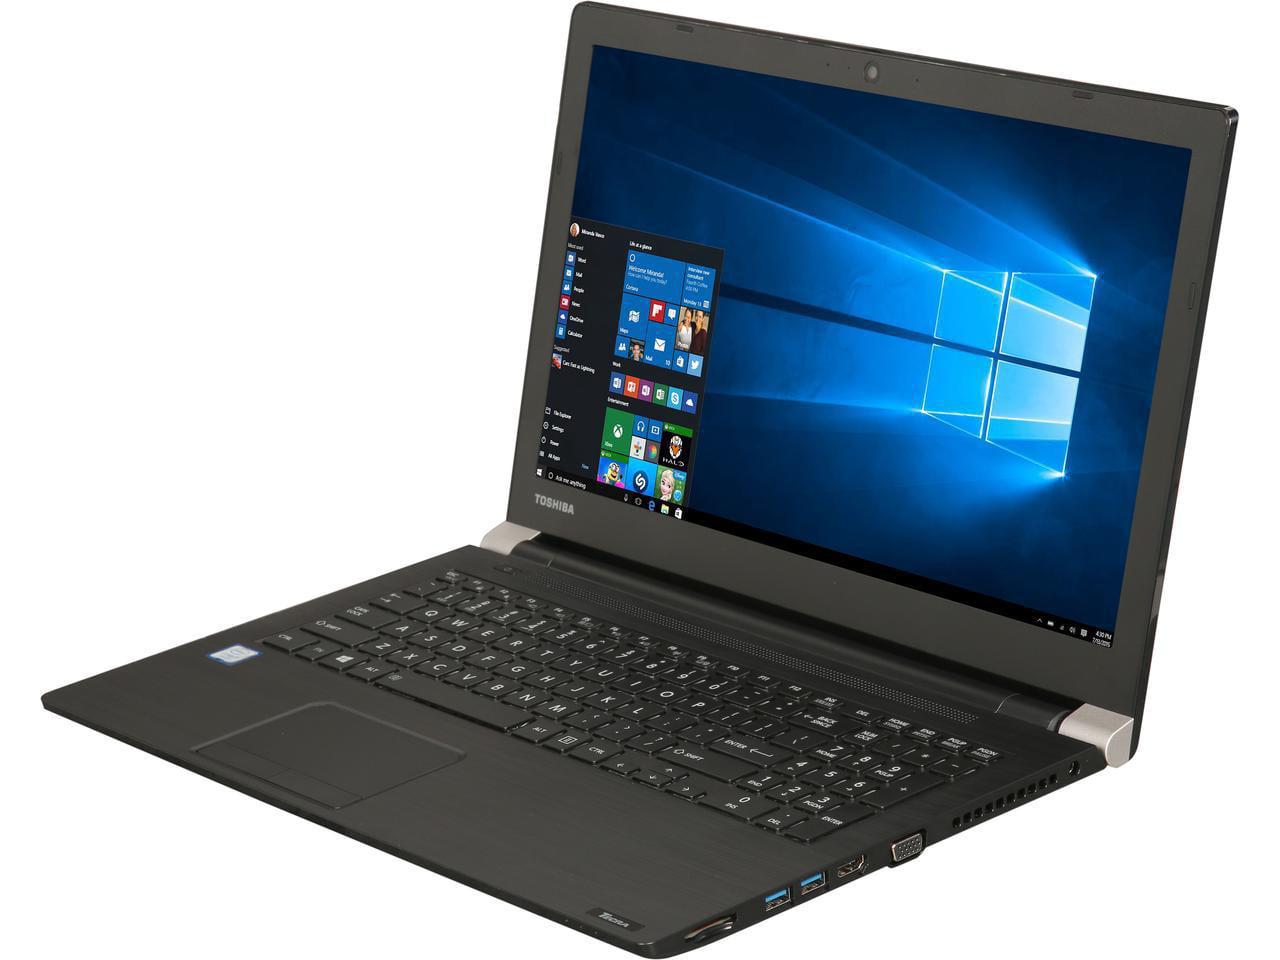 TOSHIBA Laptop Tecra A50-02H01S Intel Core i7 7th Gen 7500U (2.70 GHz) 8 GB Memory 256 GB M.2 SSD Intel HD... by Toshiba